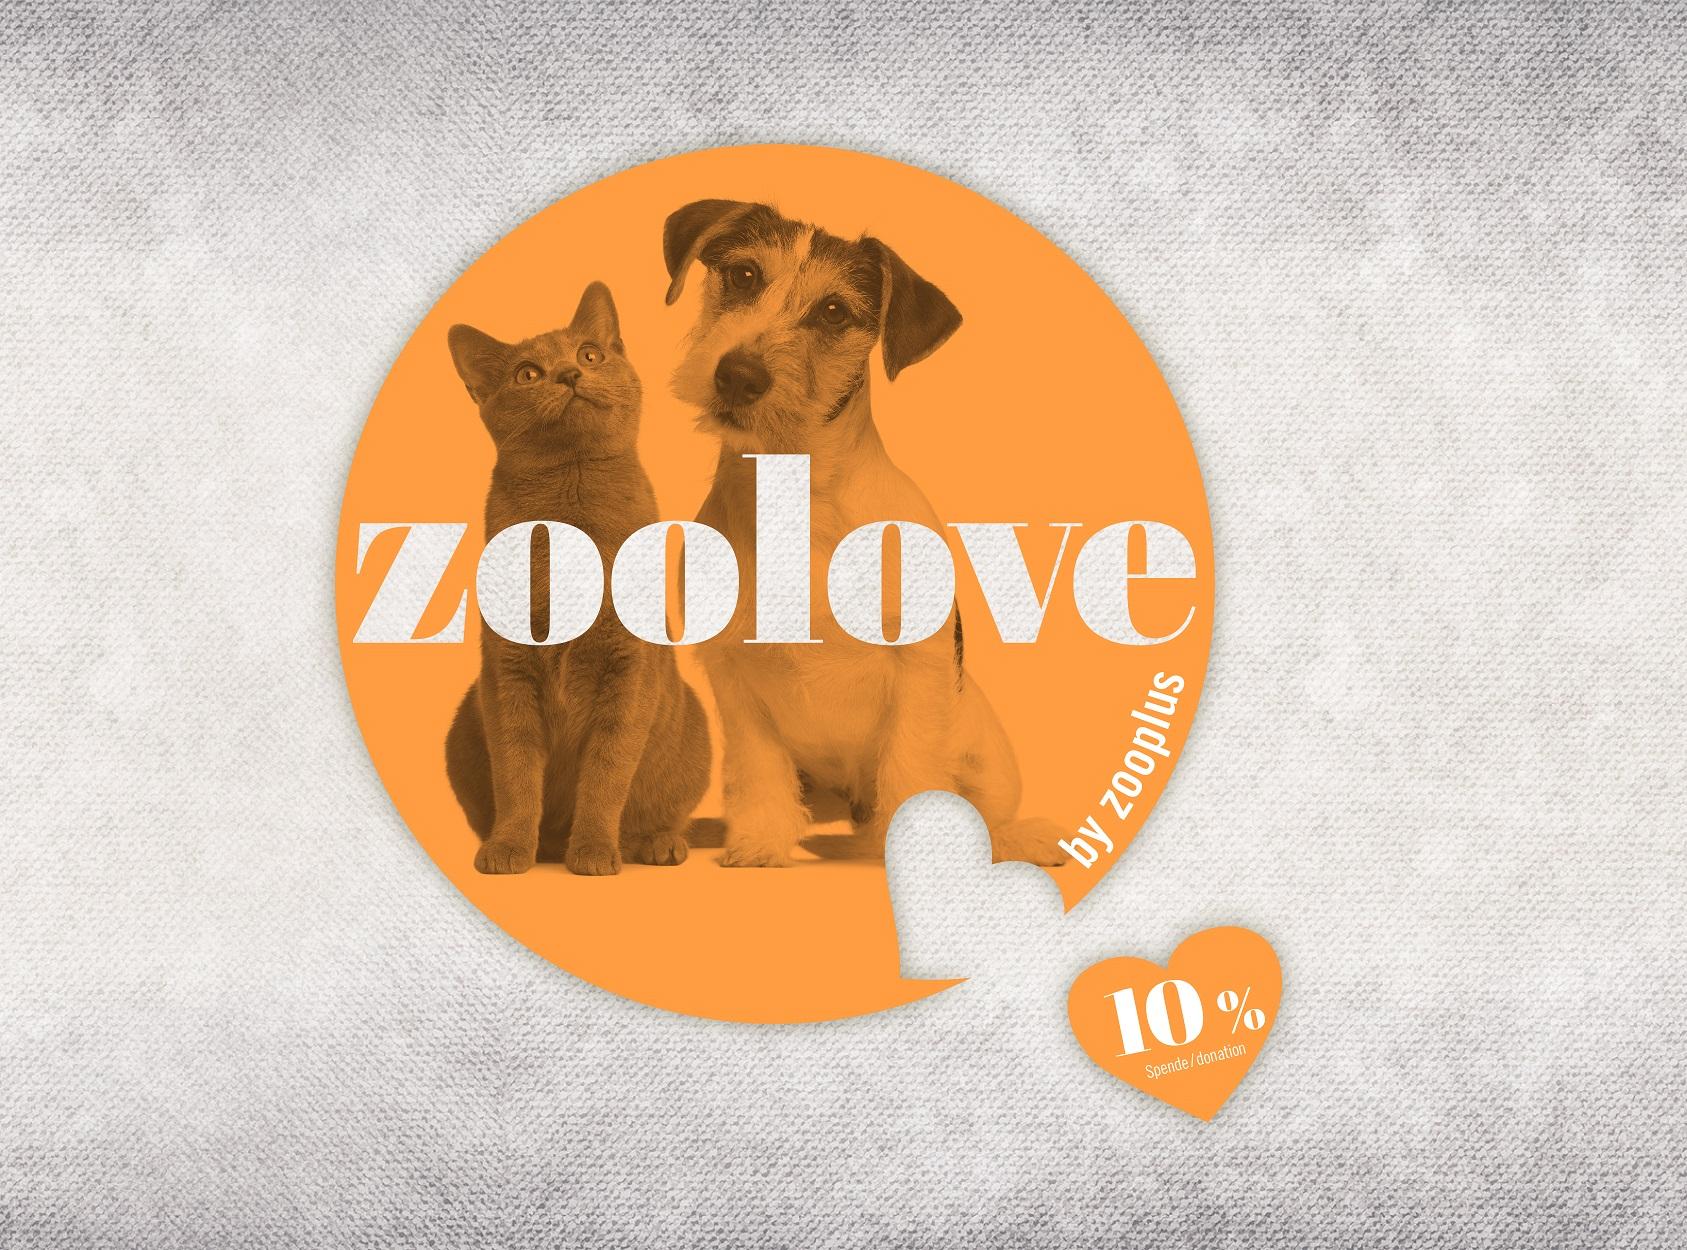 zoolove zooplus